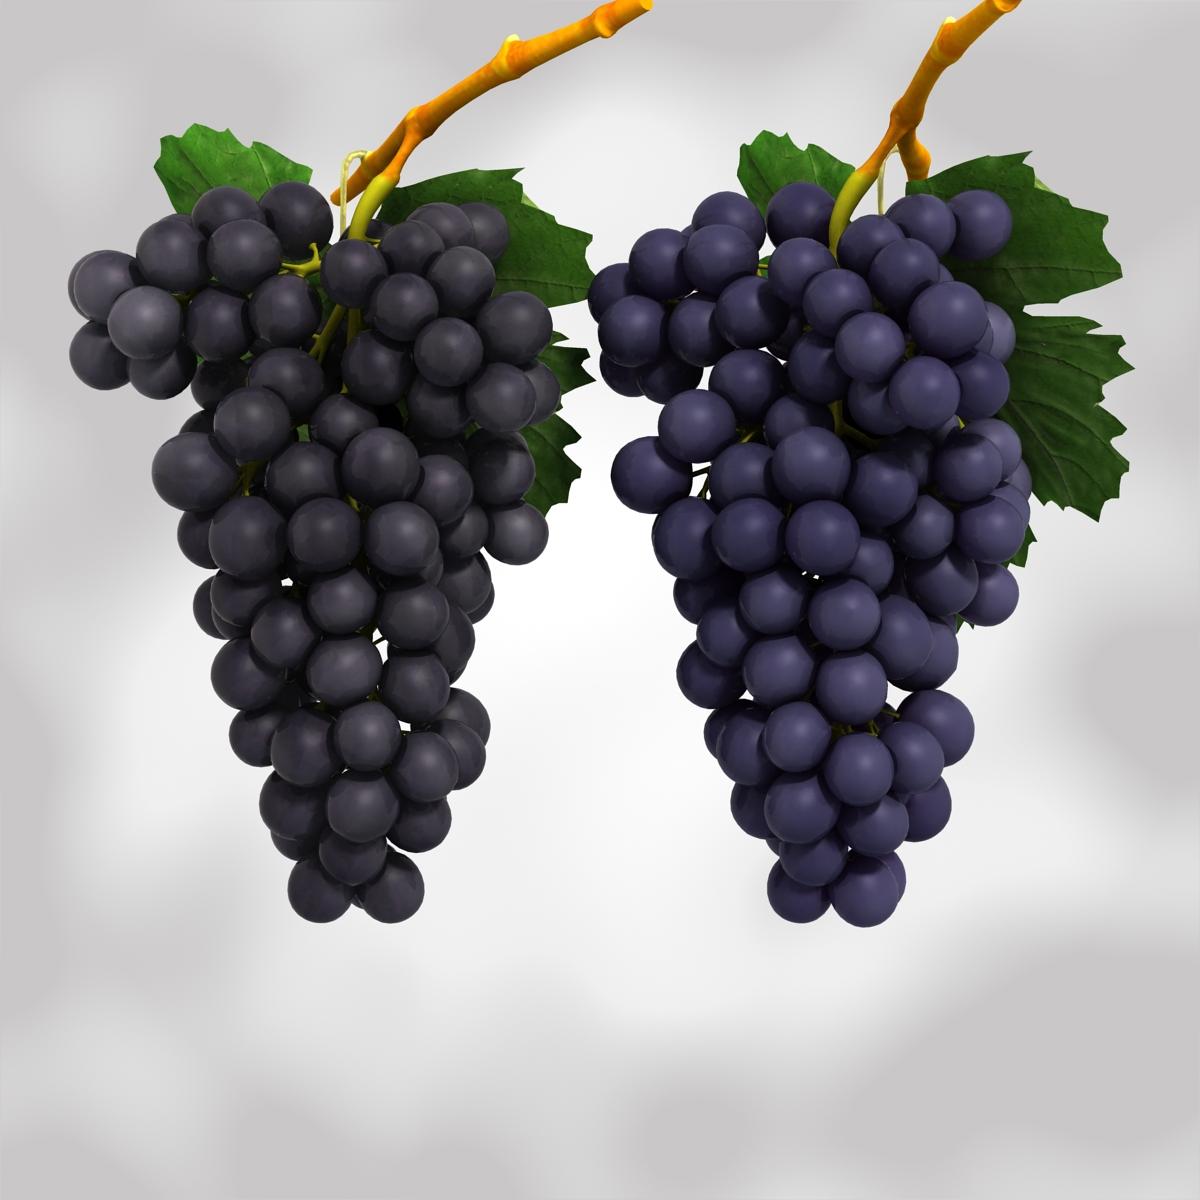 vīnogas melnā un zilā krāsā 3d modelis 3ds max fbx c4d obj 204266